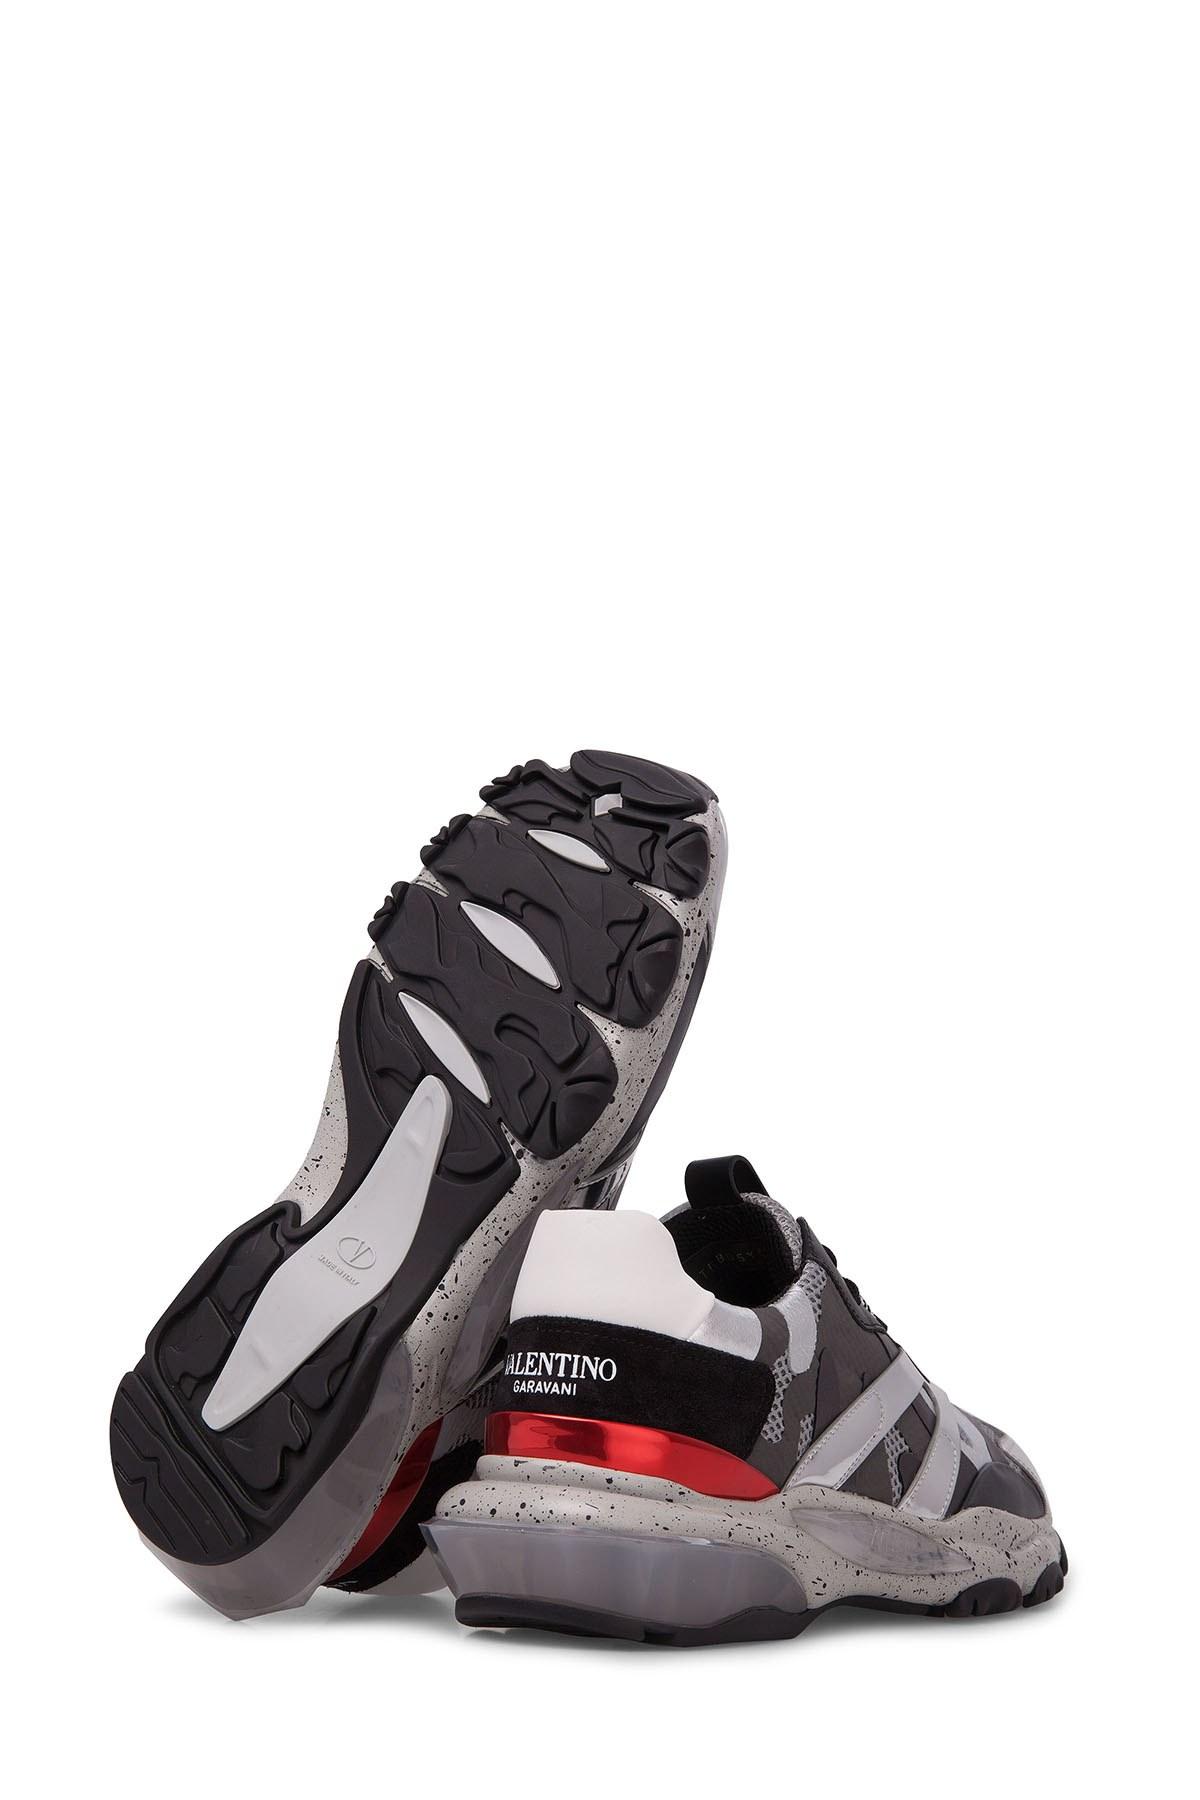 Valentino Erkek Ayakkabı RY0S0B05 GPD OMK SİYAH